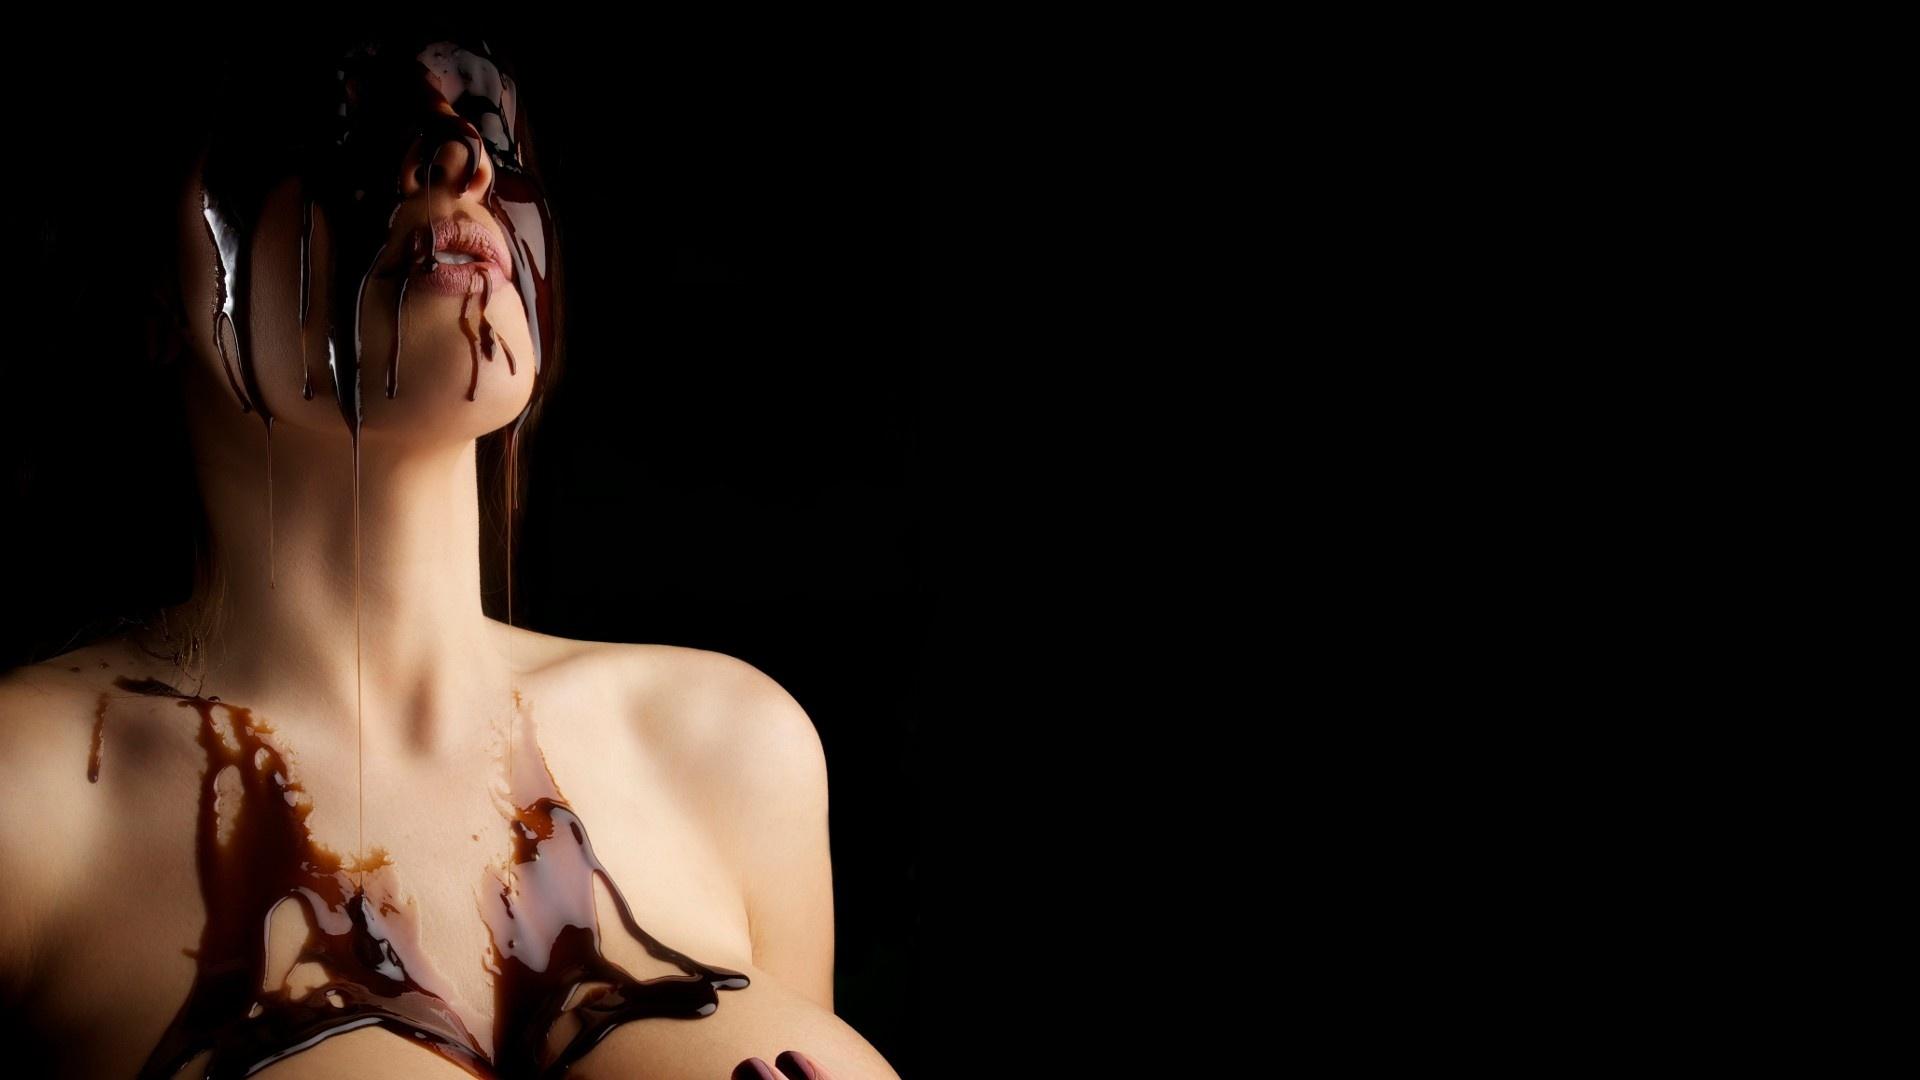 italian nude model casket